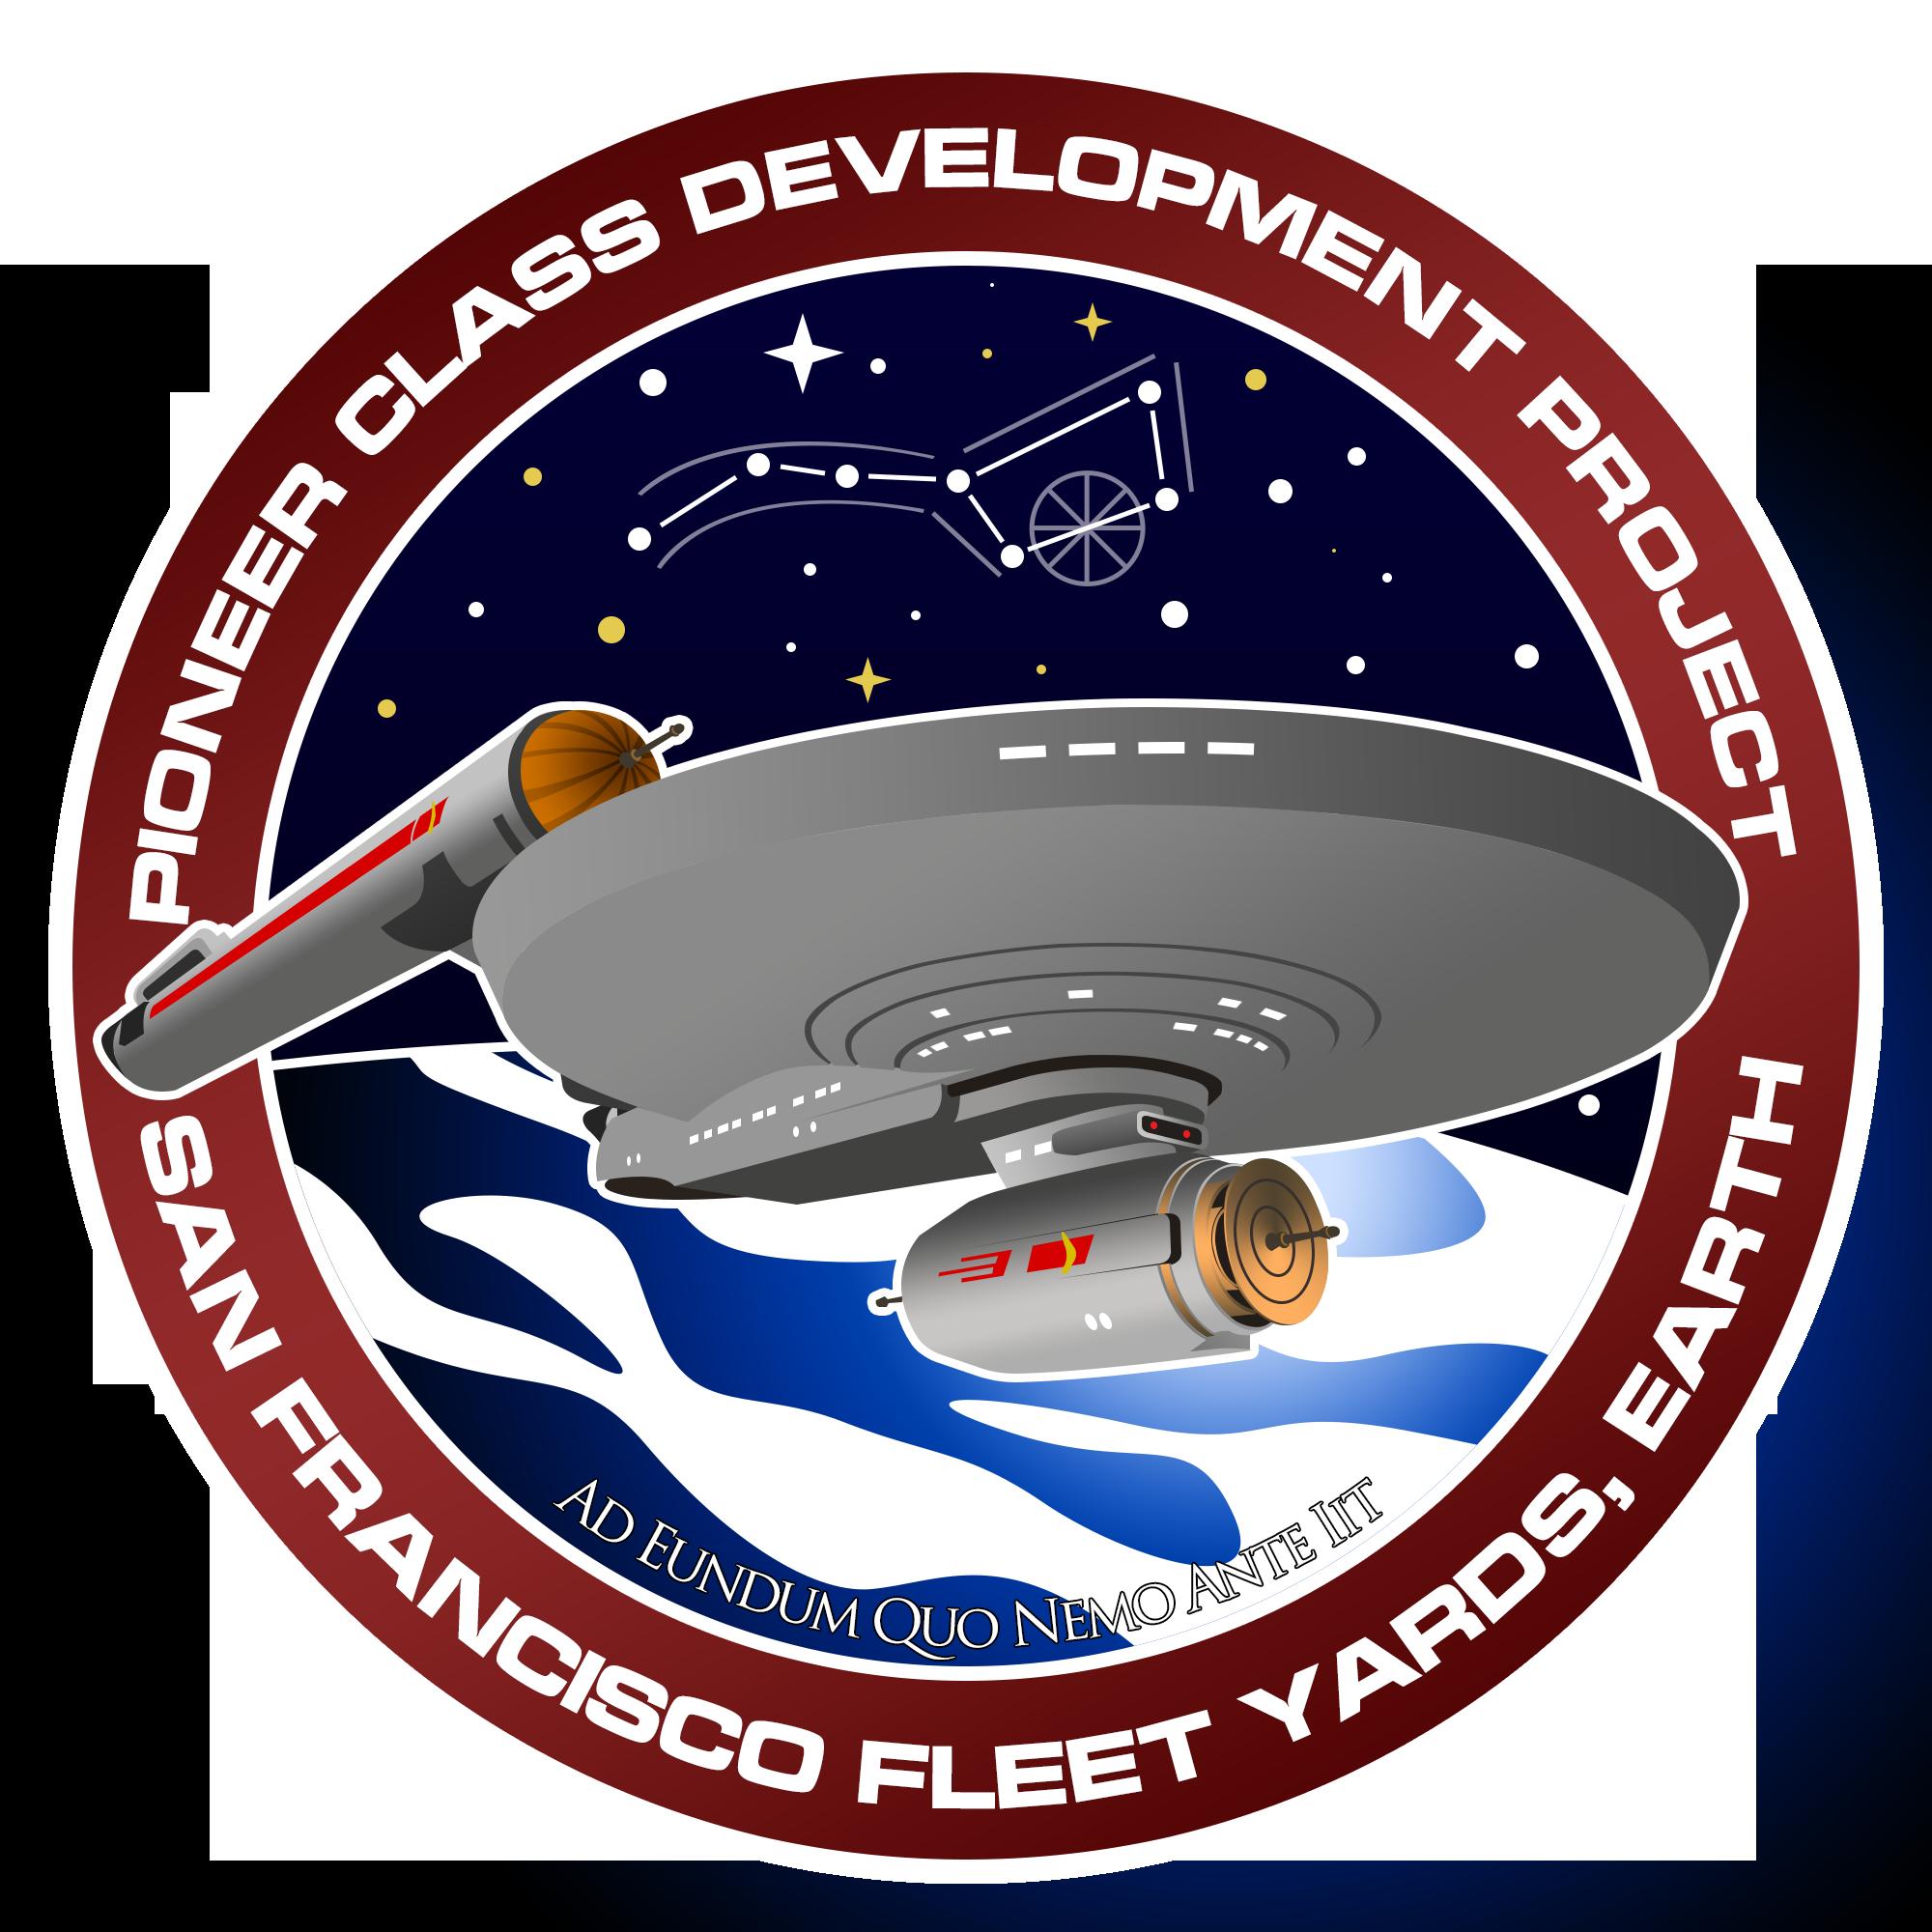 Starship star trek clipart clip art royalty free stock Made a Pioneer class development project patch : sto clip art royalty free stock